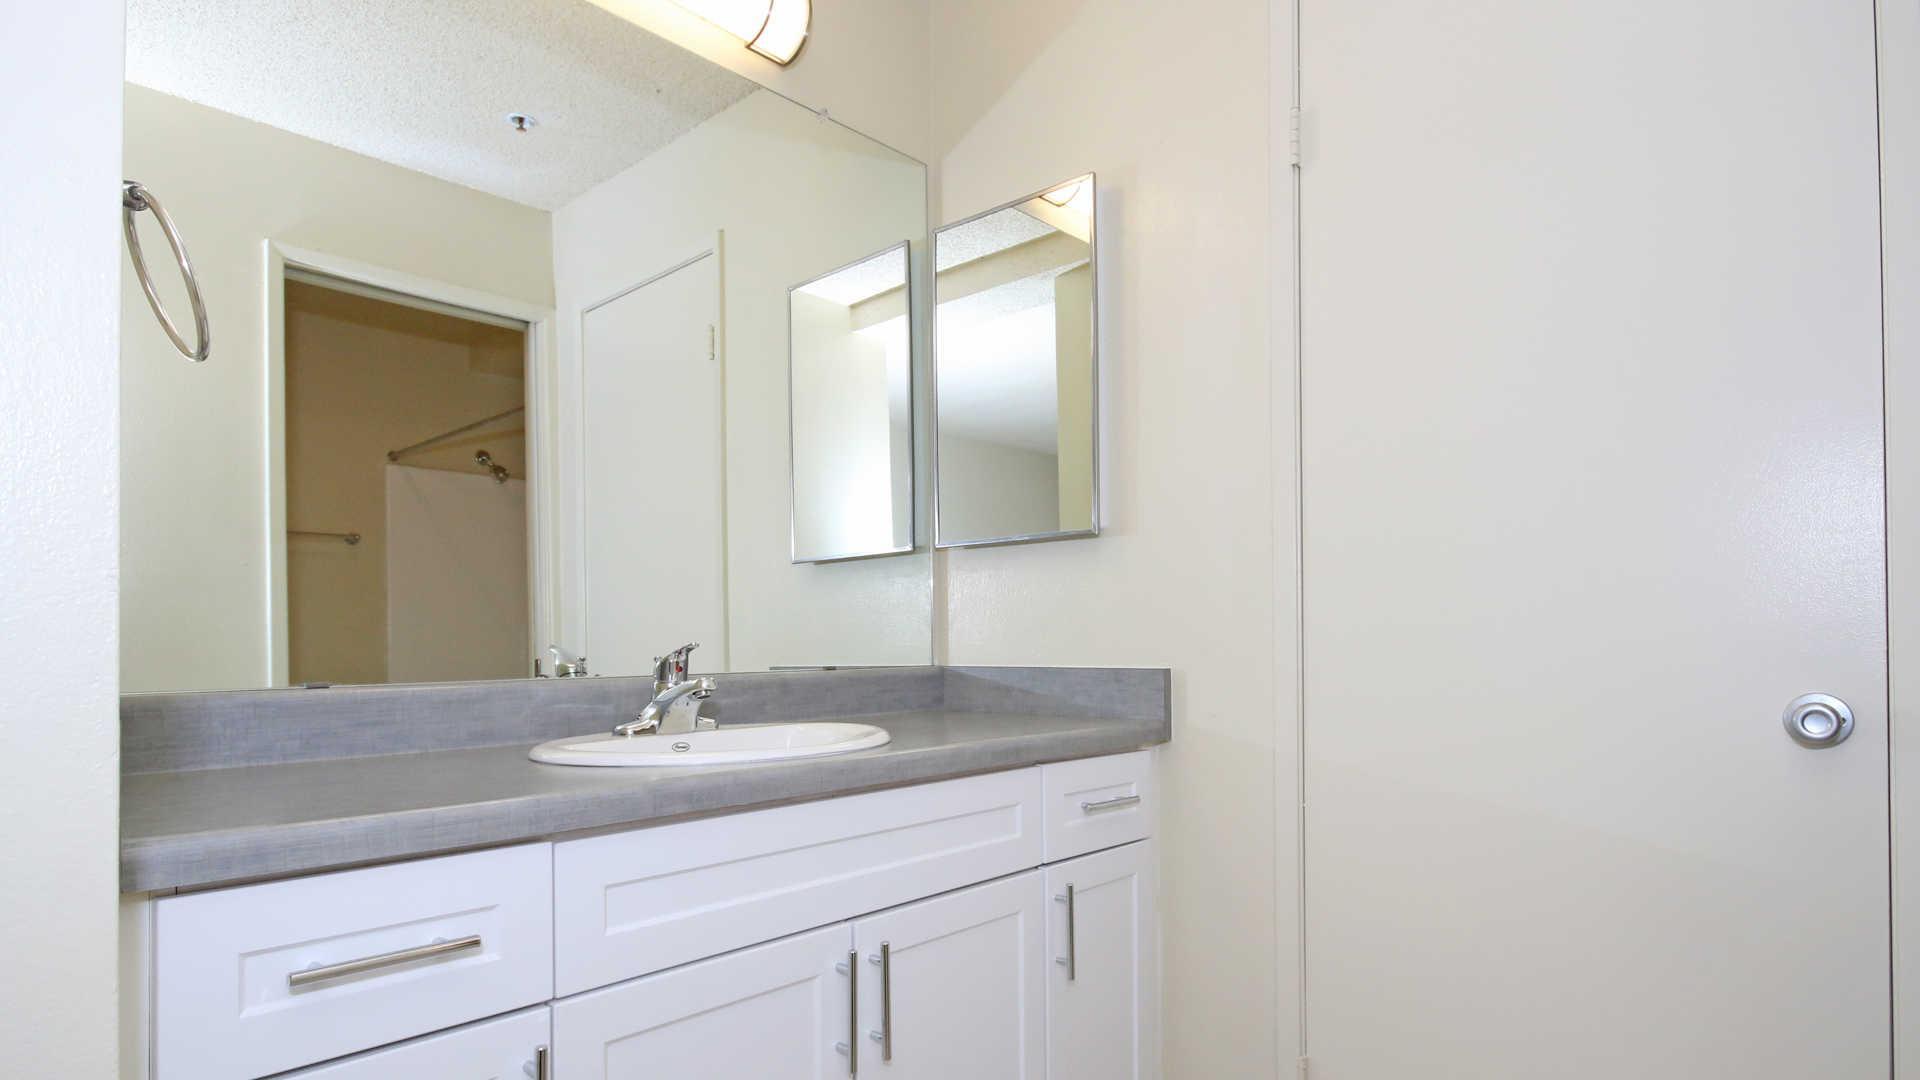 873 Stevens Ave #3212-873, Solana Beach, CA - $2,898 USD/ month